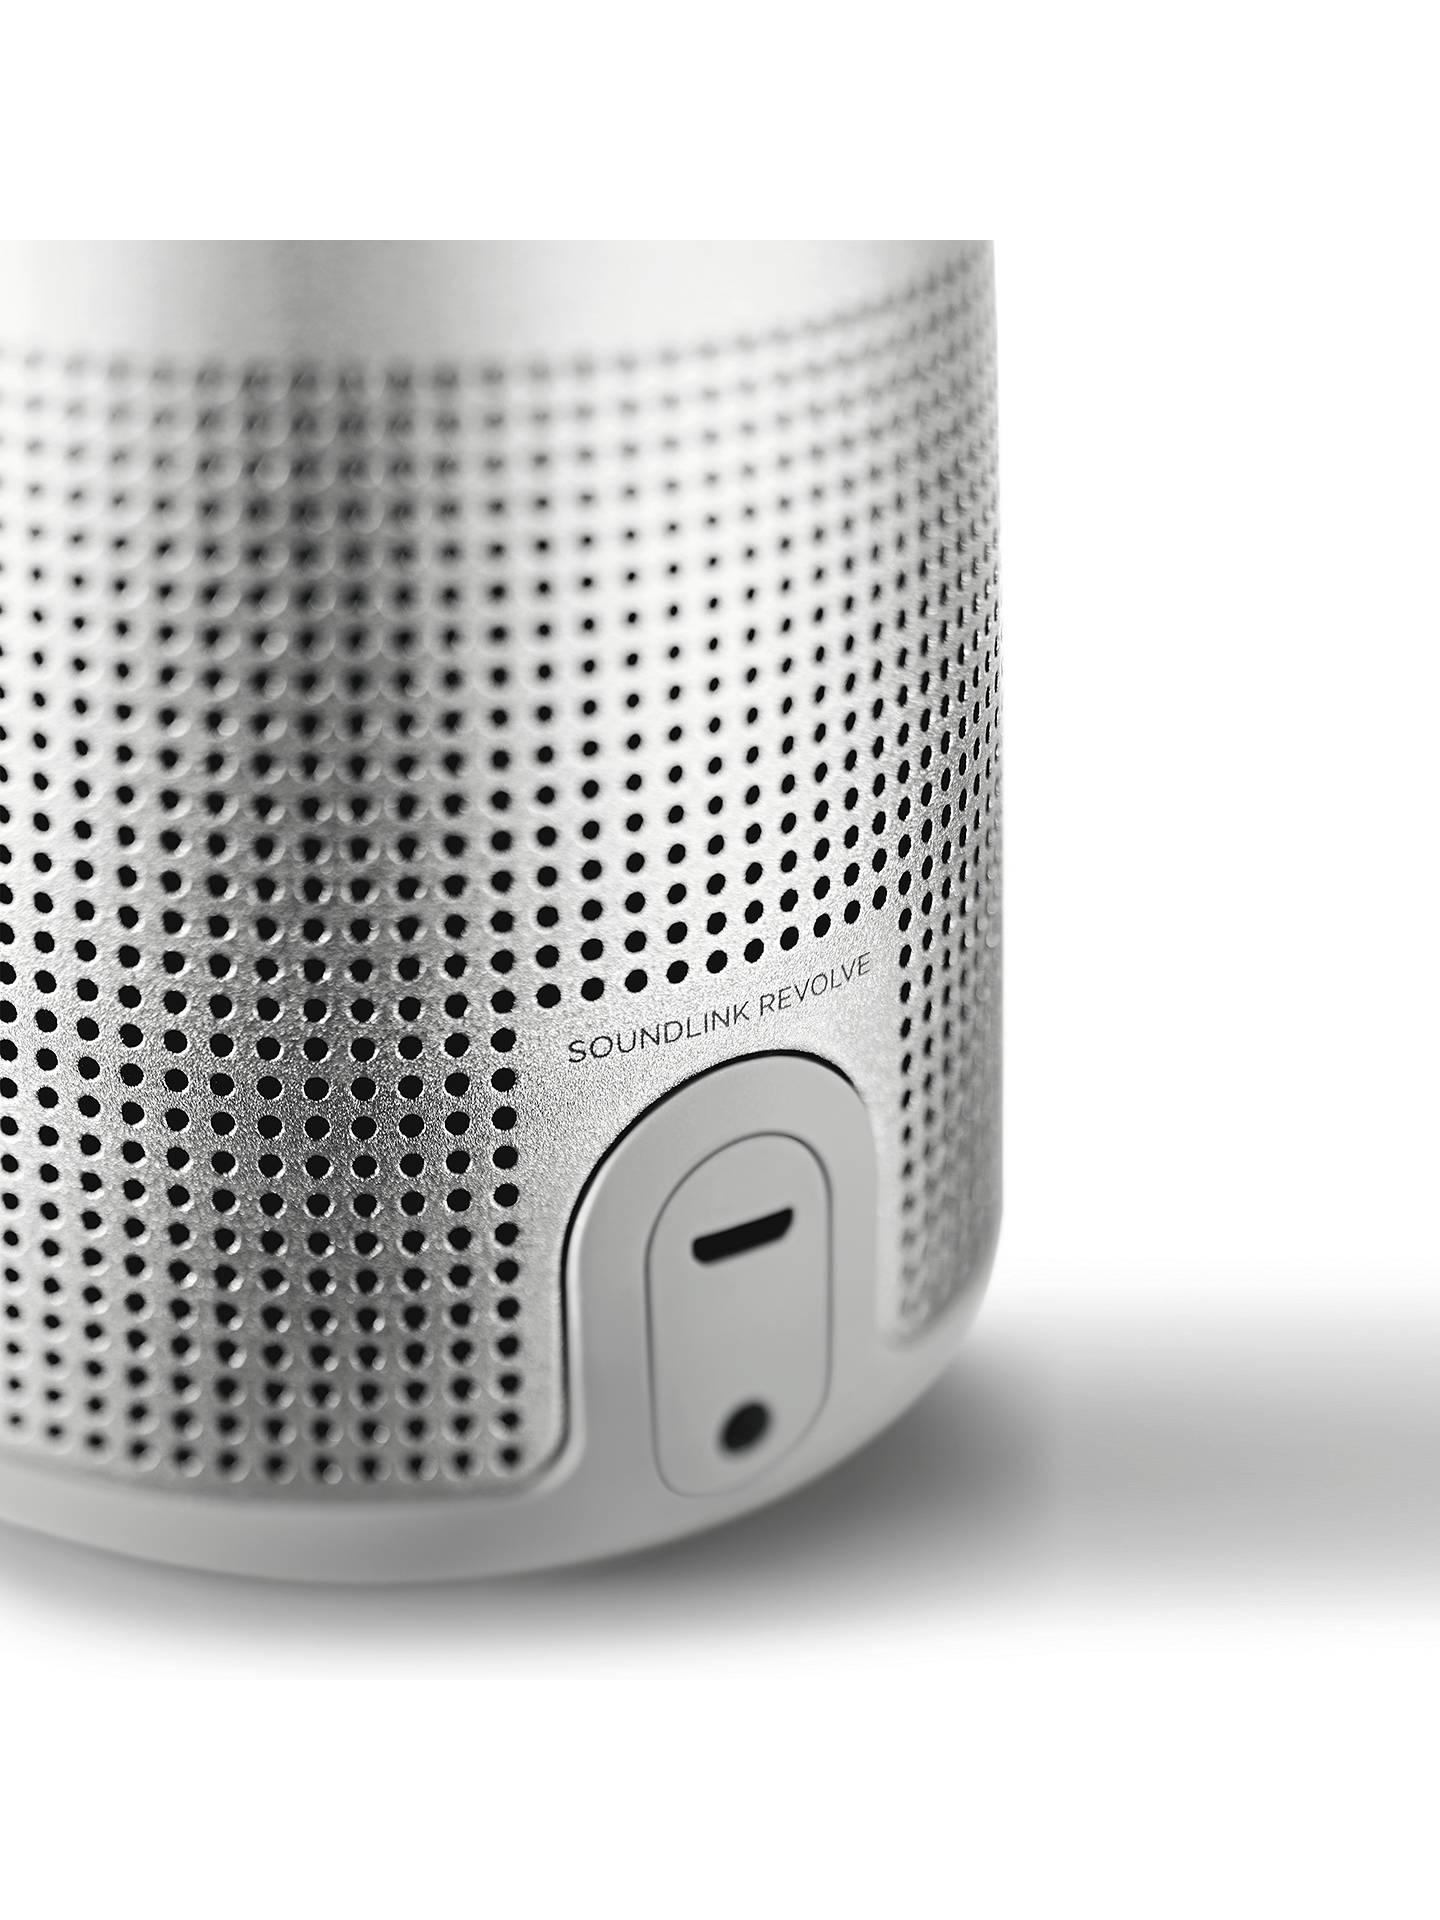 Bose® SoundLink® Revolve Water-resistant Portable Bluetooth Speaker with Built-in Speakerphone, Lux Grey